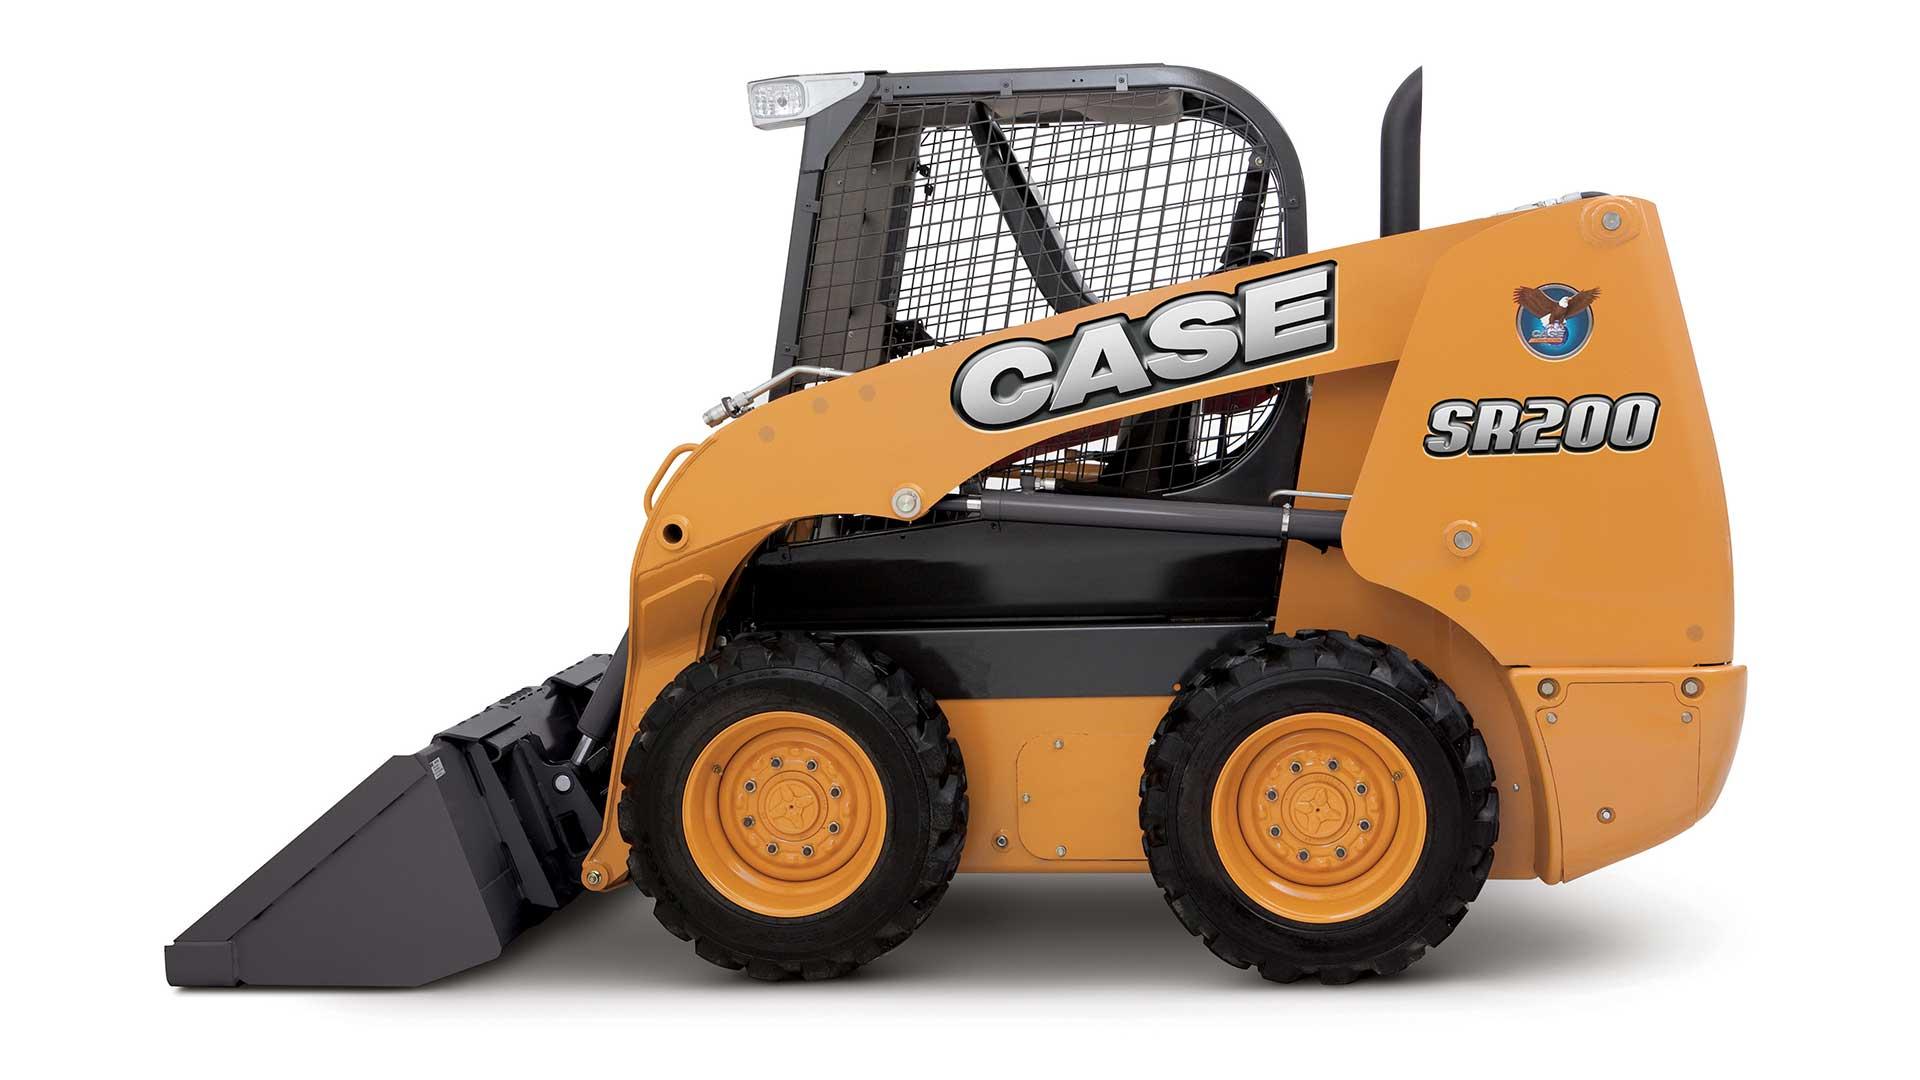 Case Skid Steer SR200